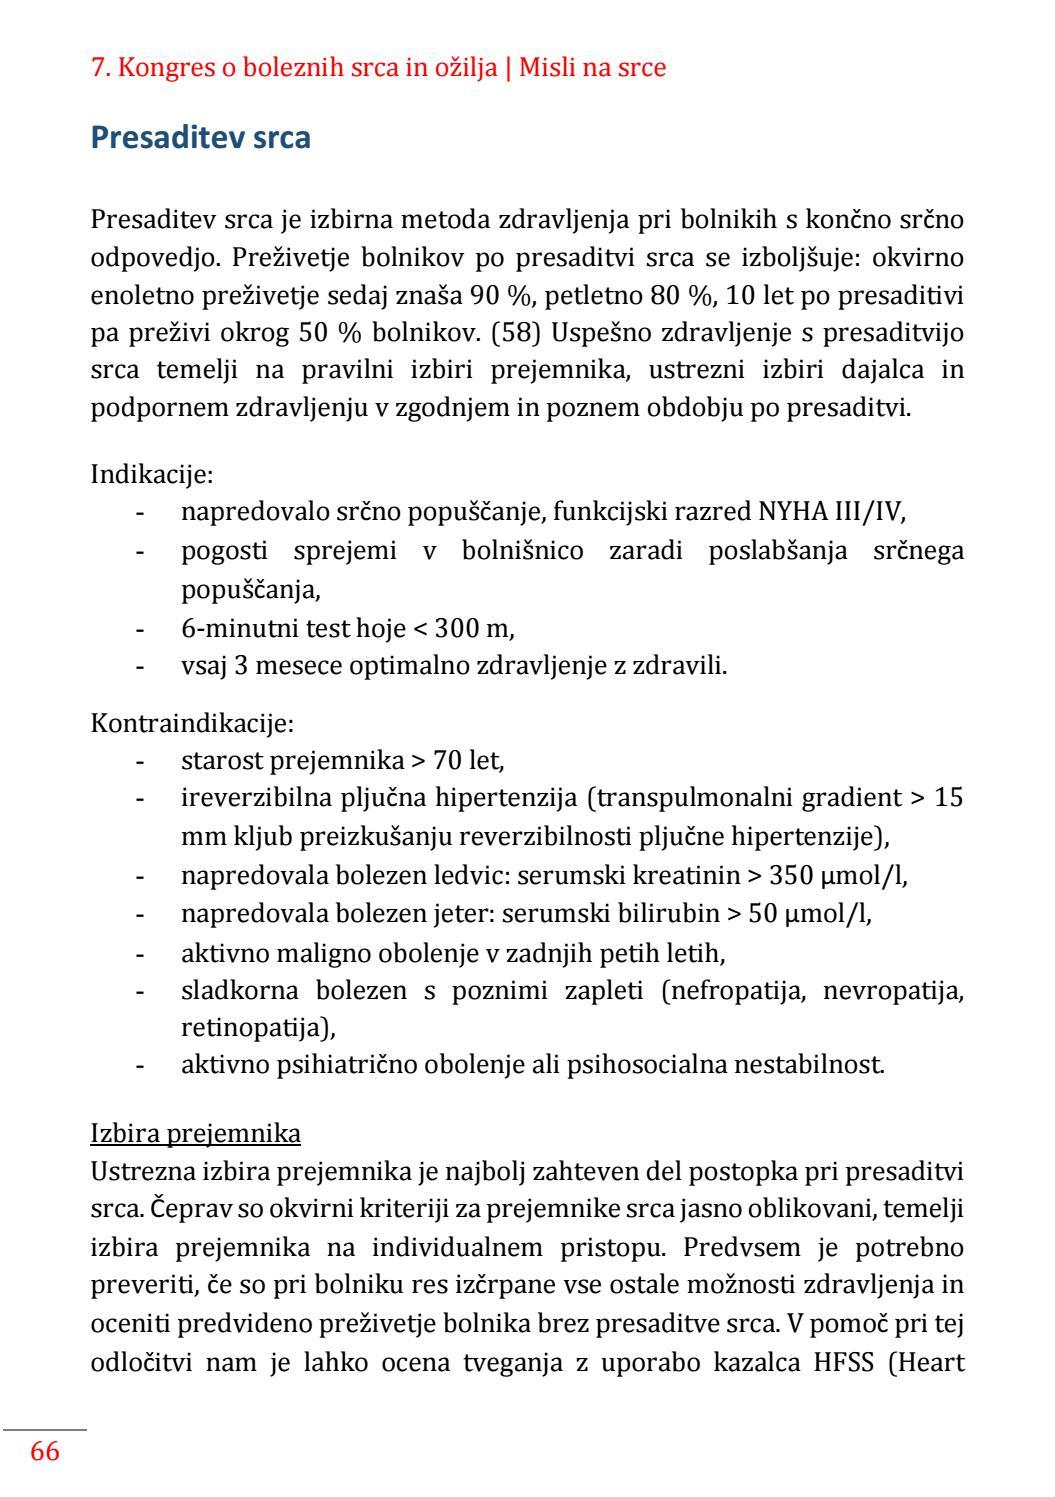 hipertenzija 3- razred)